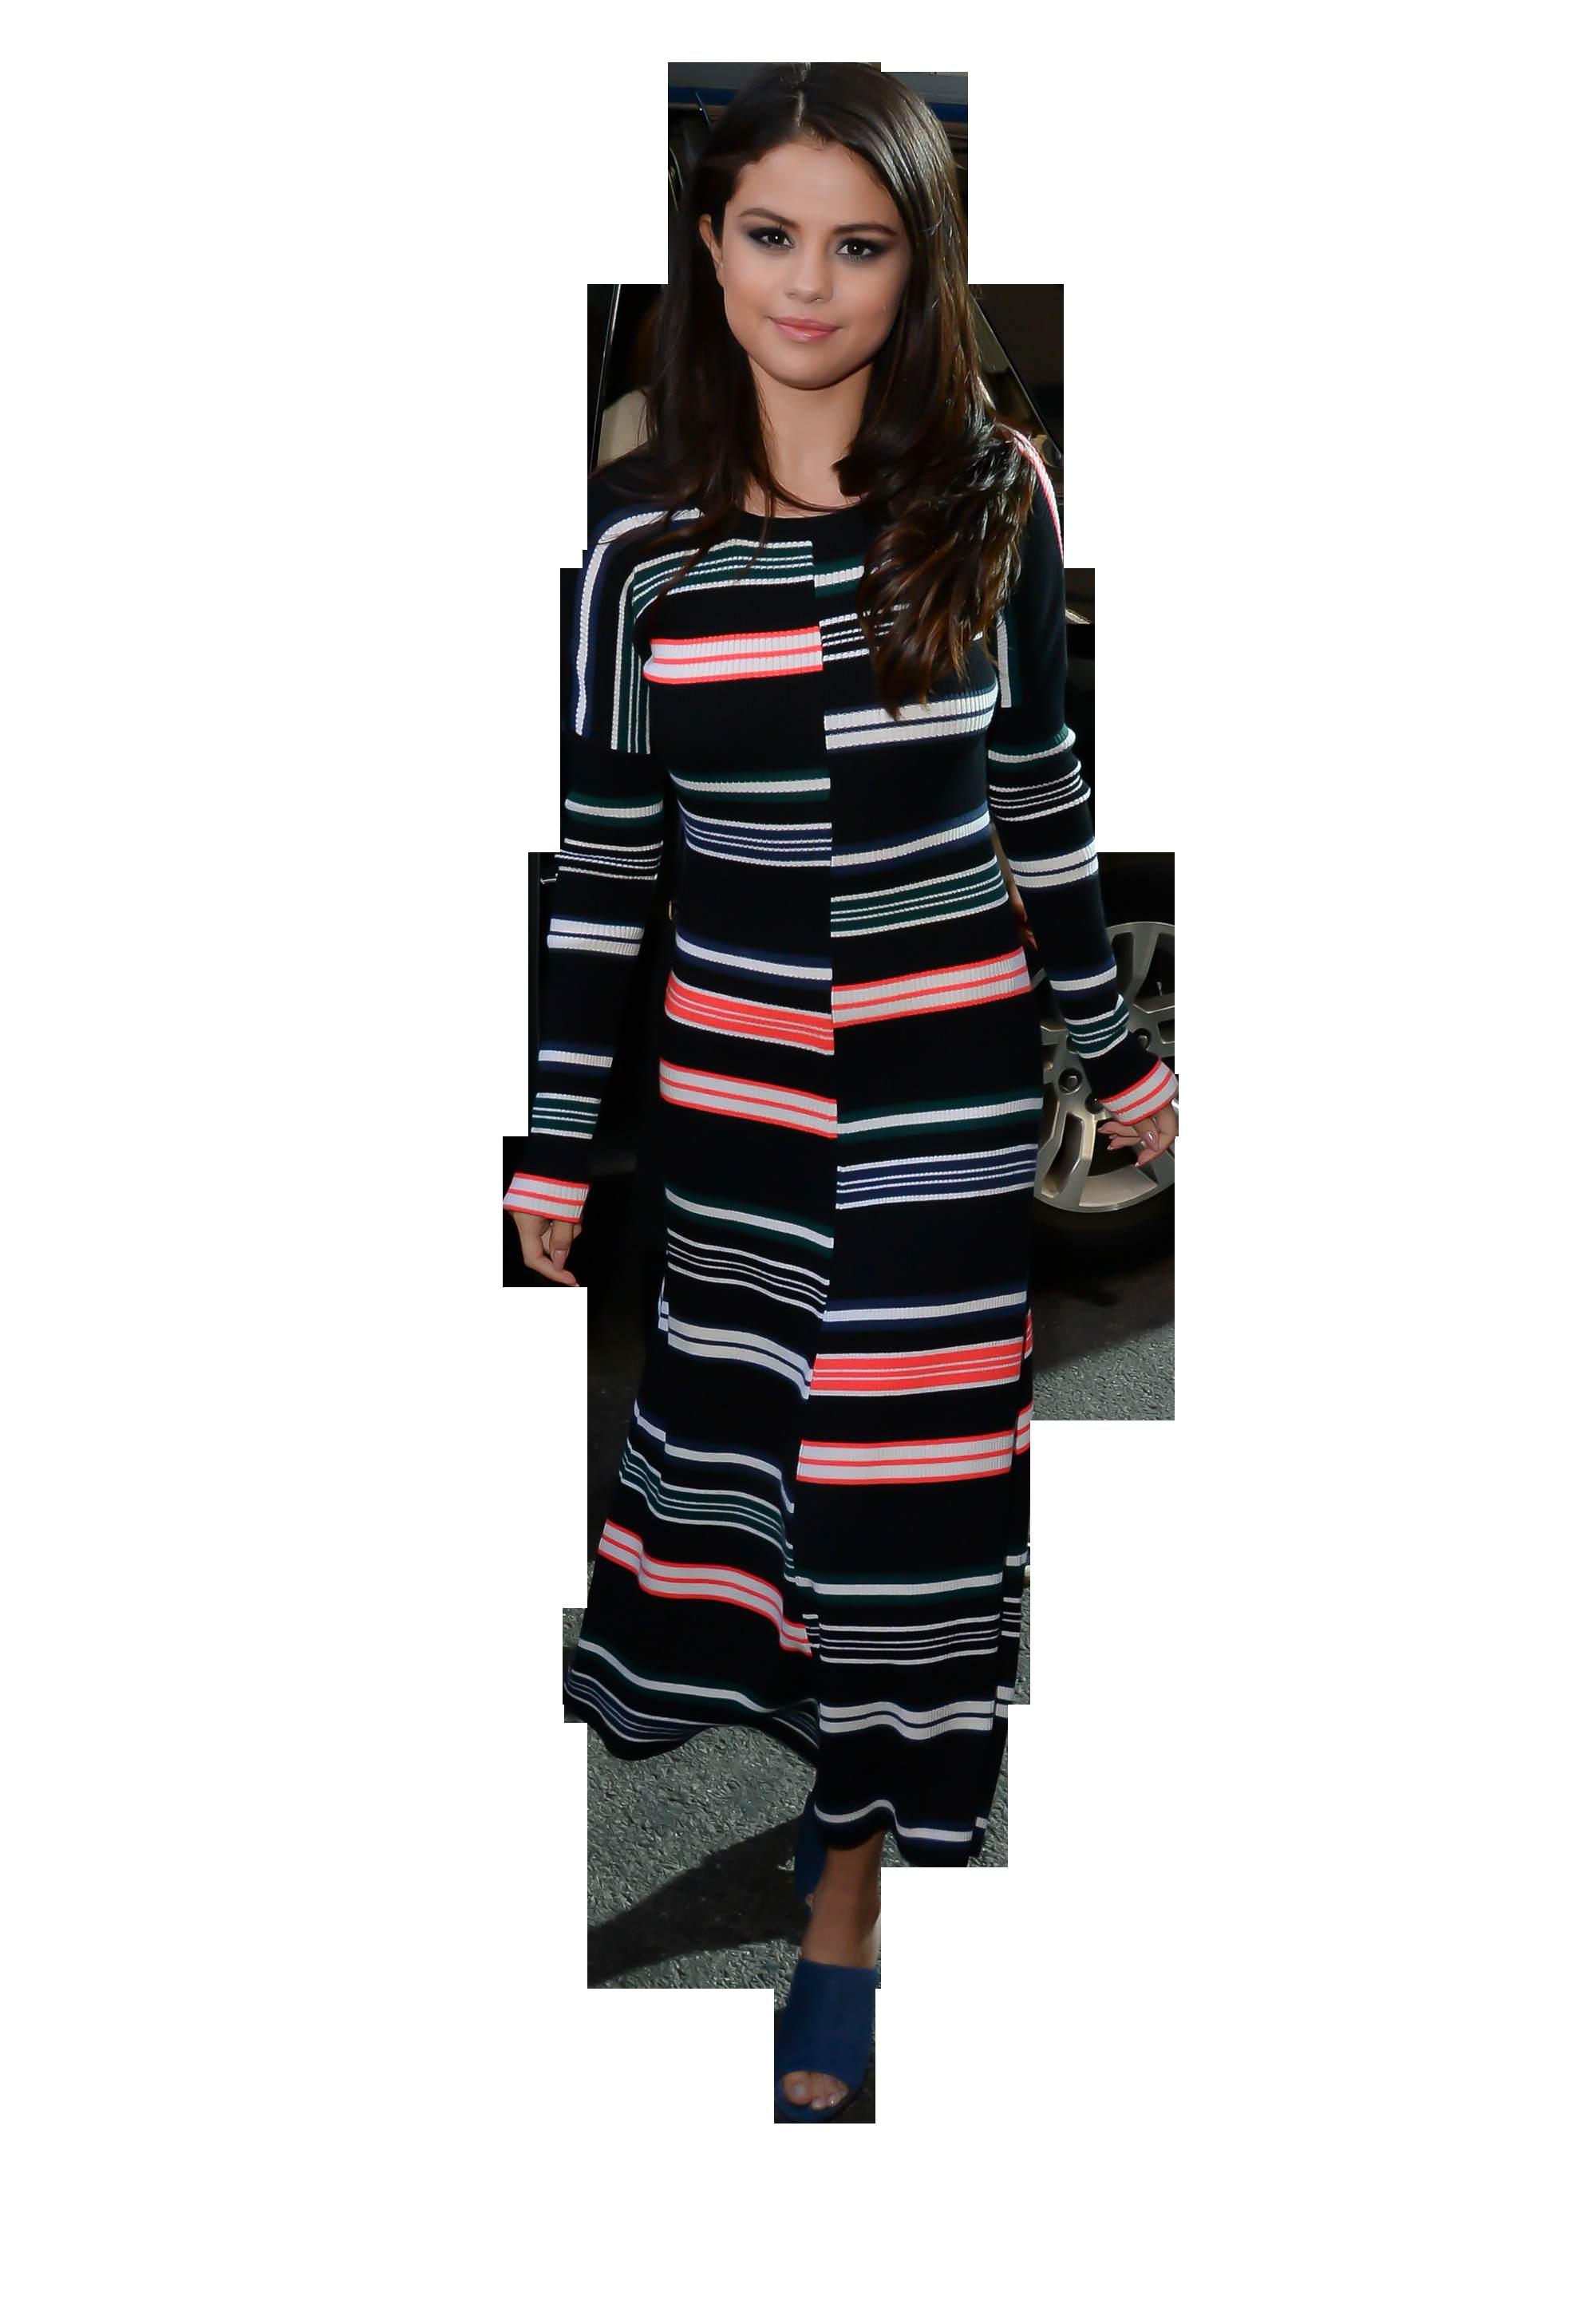 Selena Gomez Walking PNG Image